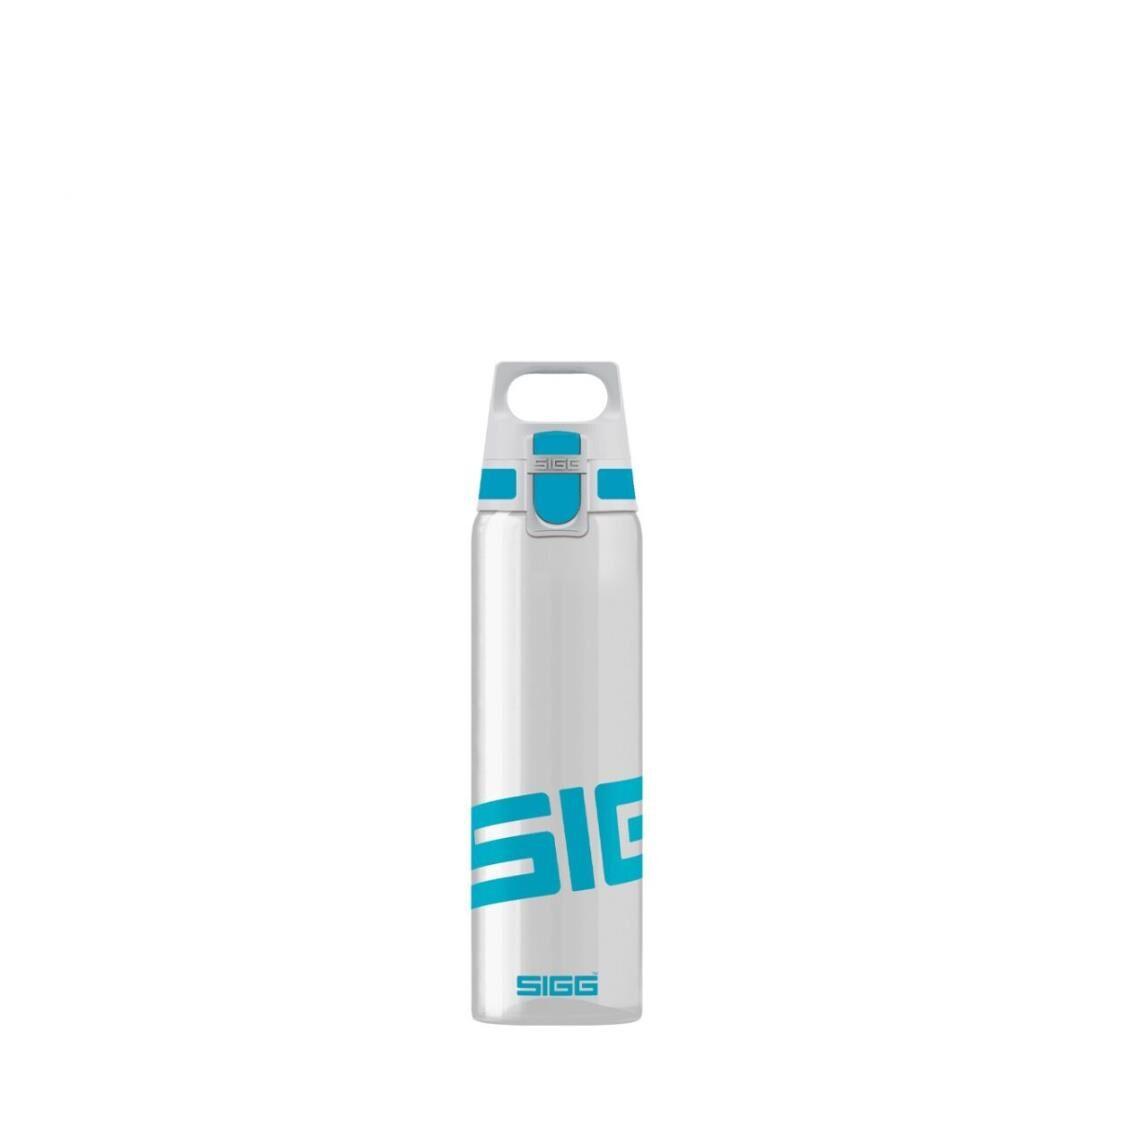 Sigg Total Clear One 750ml Water Bottle 863290  Aqua